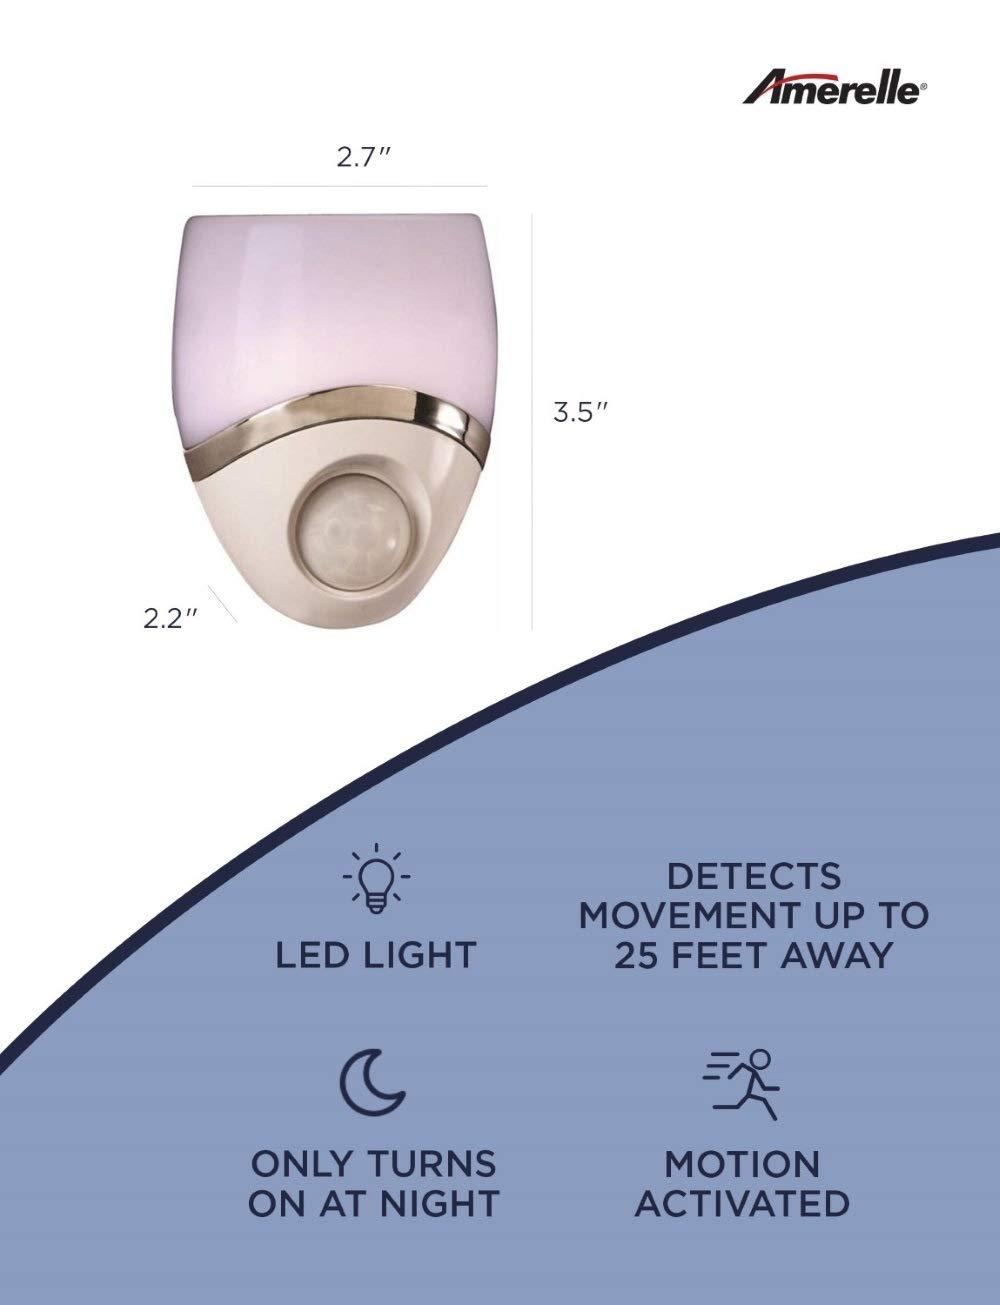 b44eb1eb447d Westek Motion-Sensor LED Night Light - Plug-In LED Lights Turn on When  Sensor Detects Motion - Ideal for Bedroom, Bathroom, Hallway, Nursery,  Garage, ...